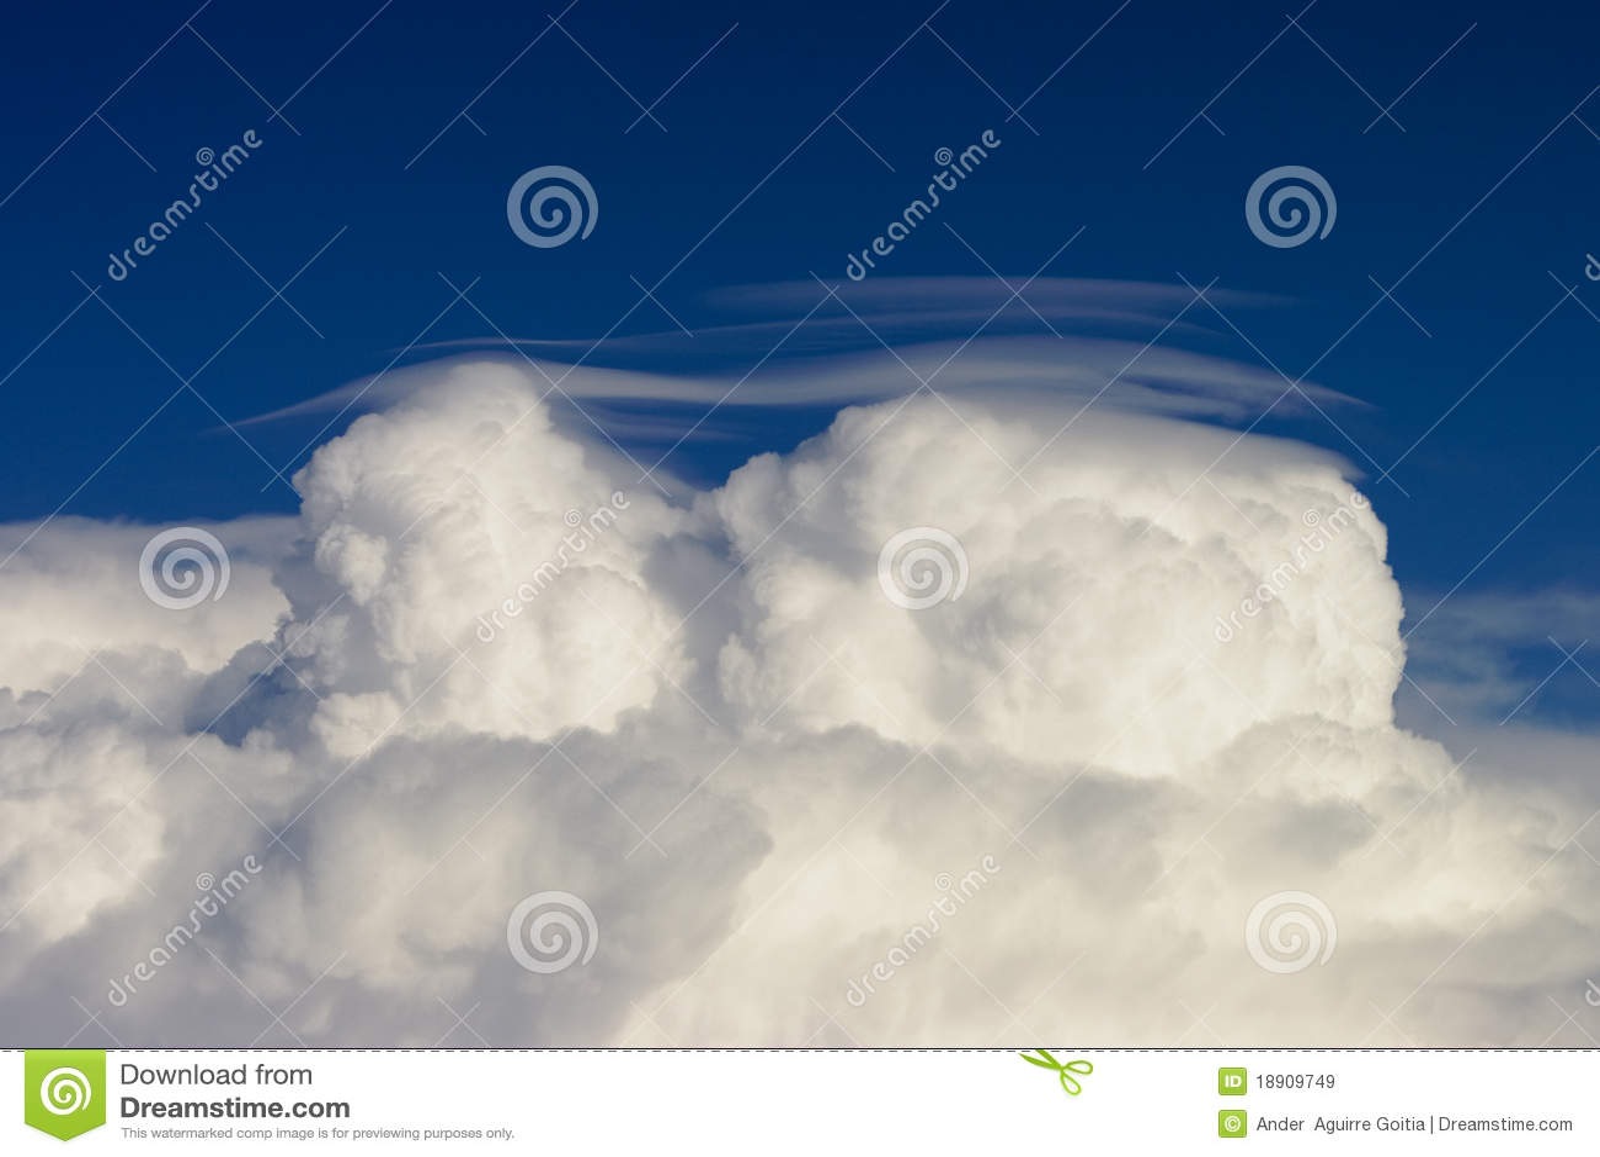 Nube a cappuccio del cumulo